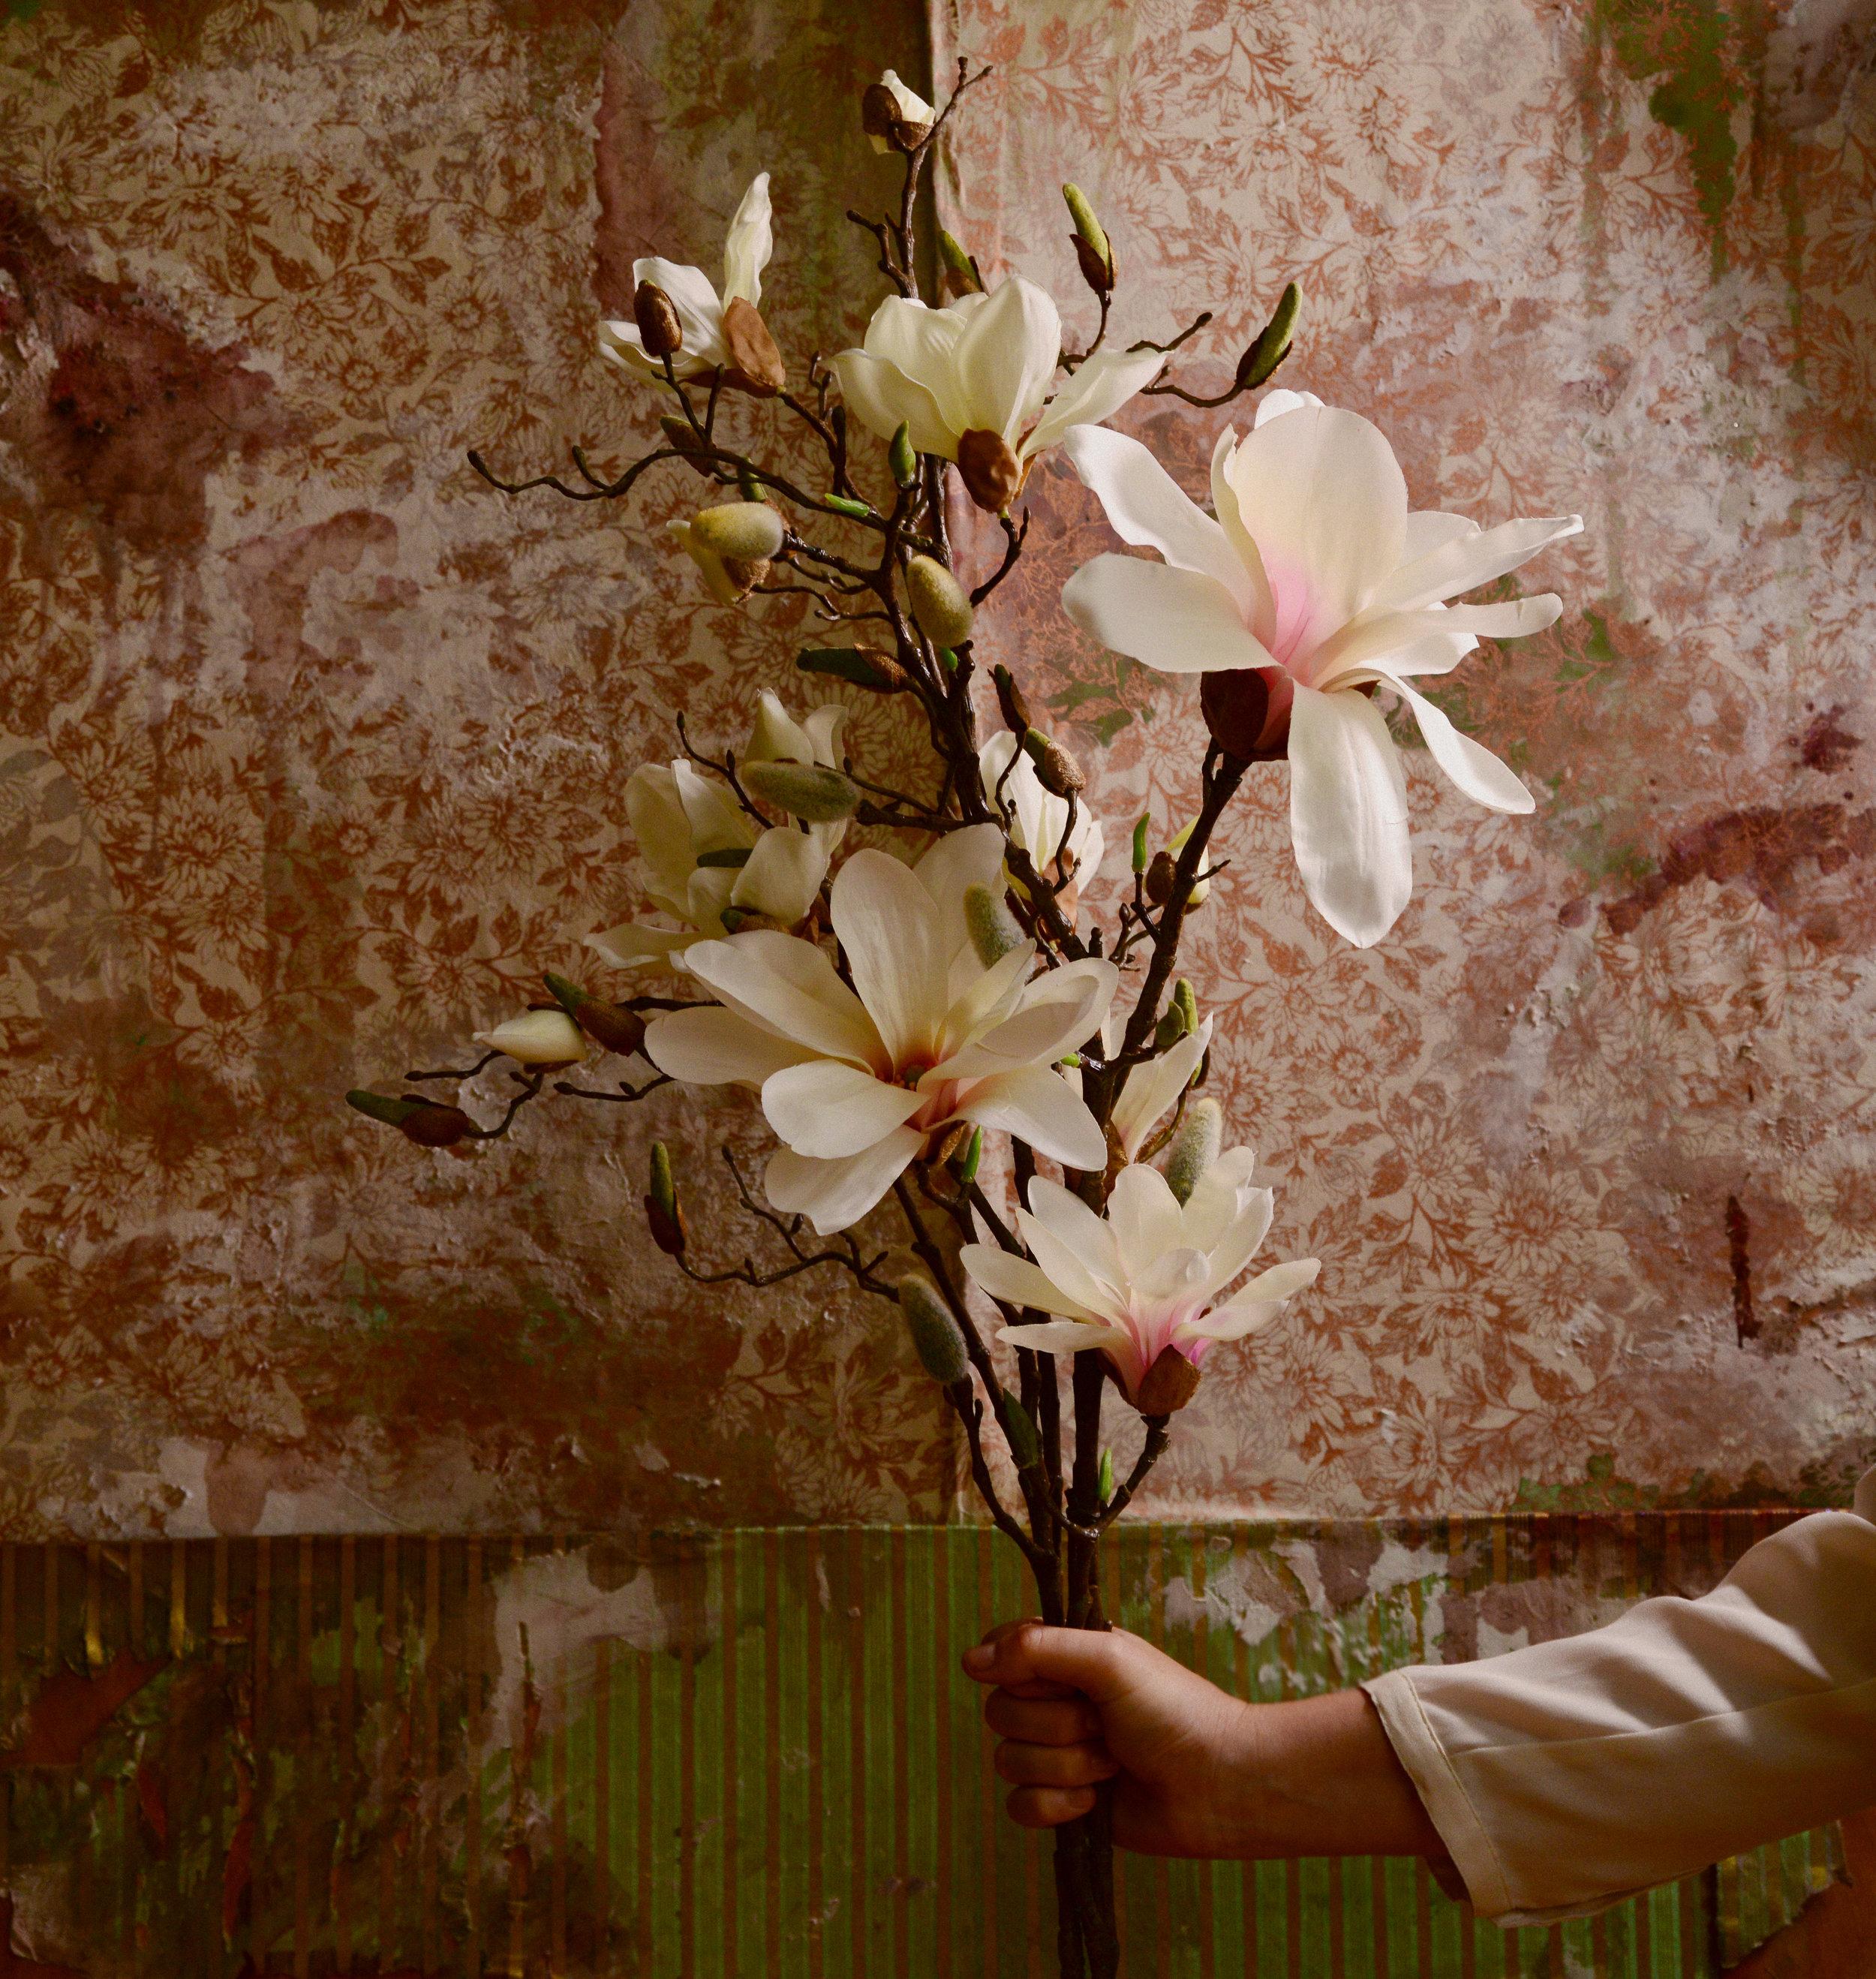 Letitia VanSant  // Promo Photoshoot   Faux distressed backdrop // Props // Styling   Photo by  Shervin Lainez